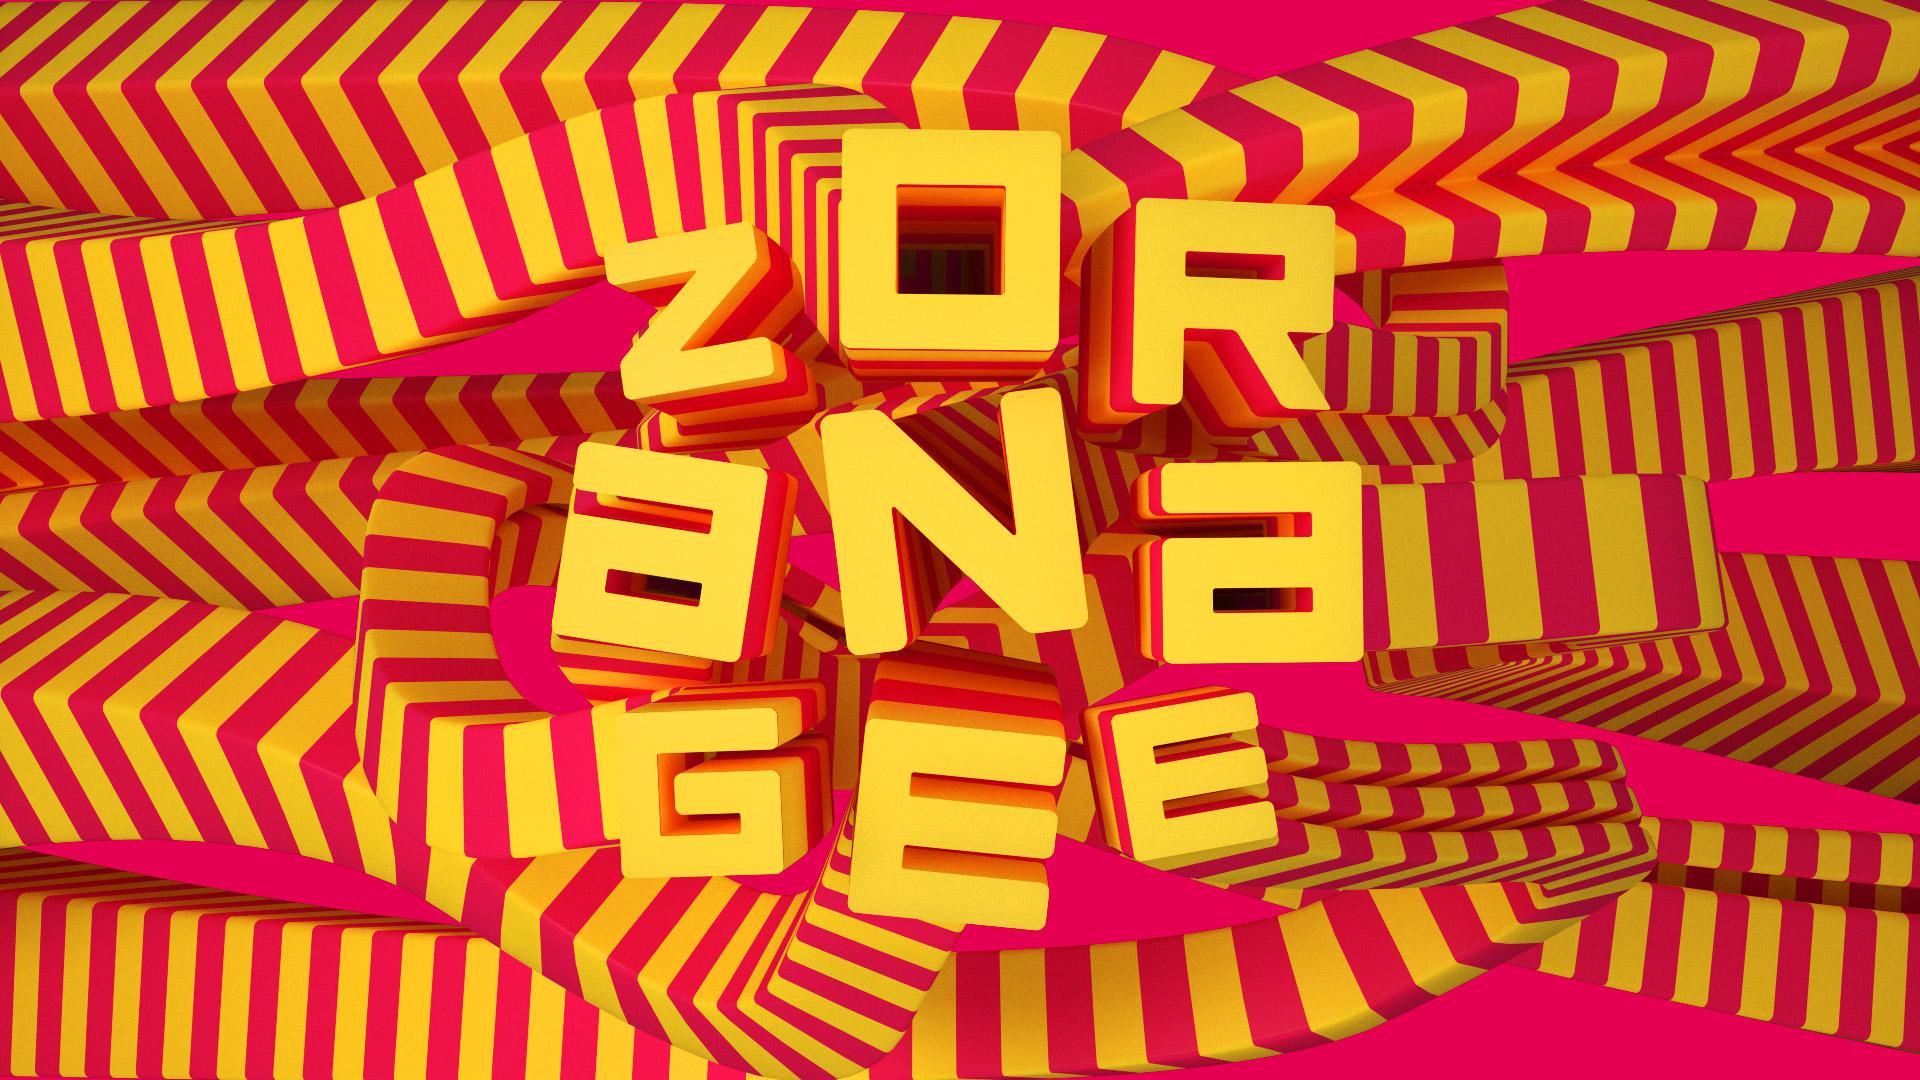 Adobe Make It Zorana Gee